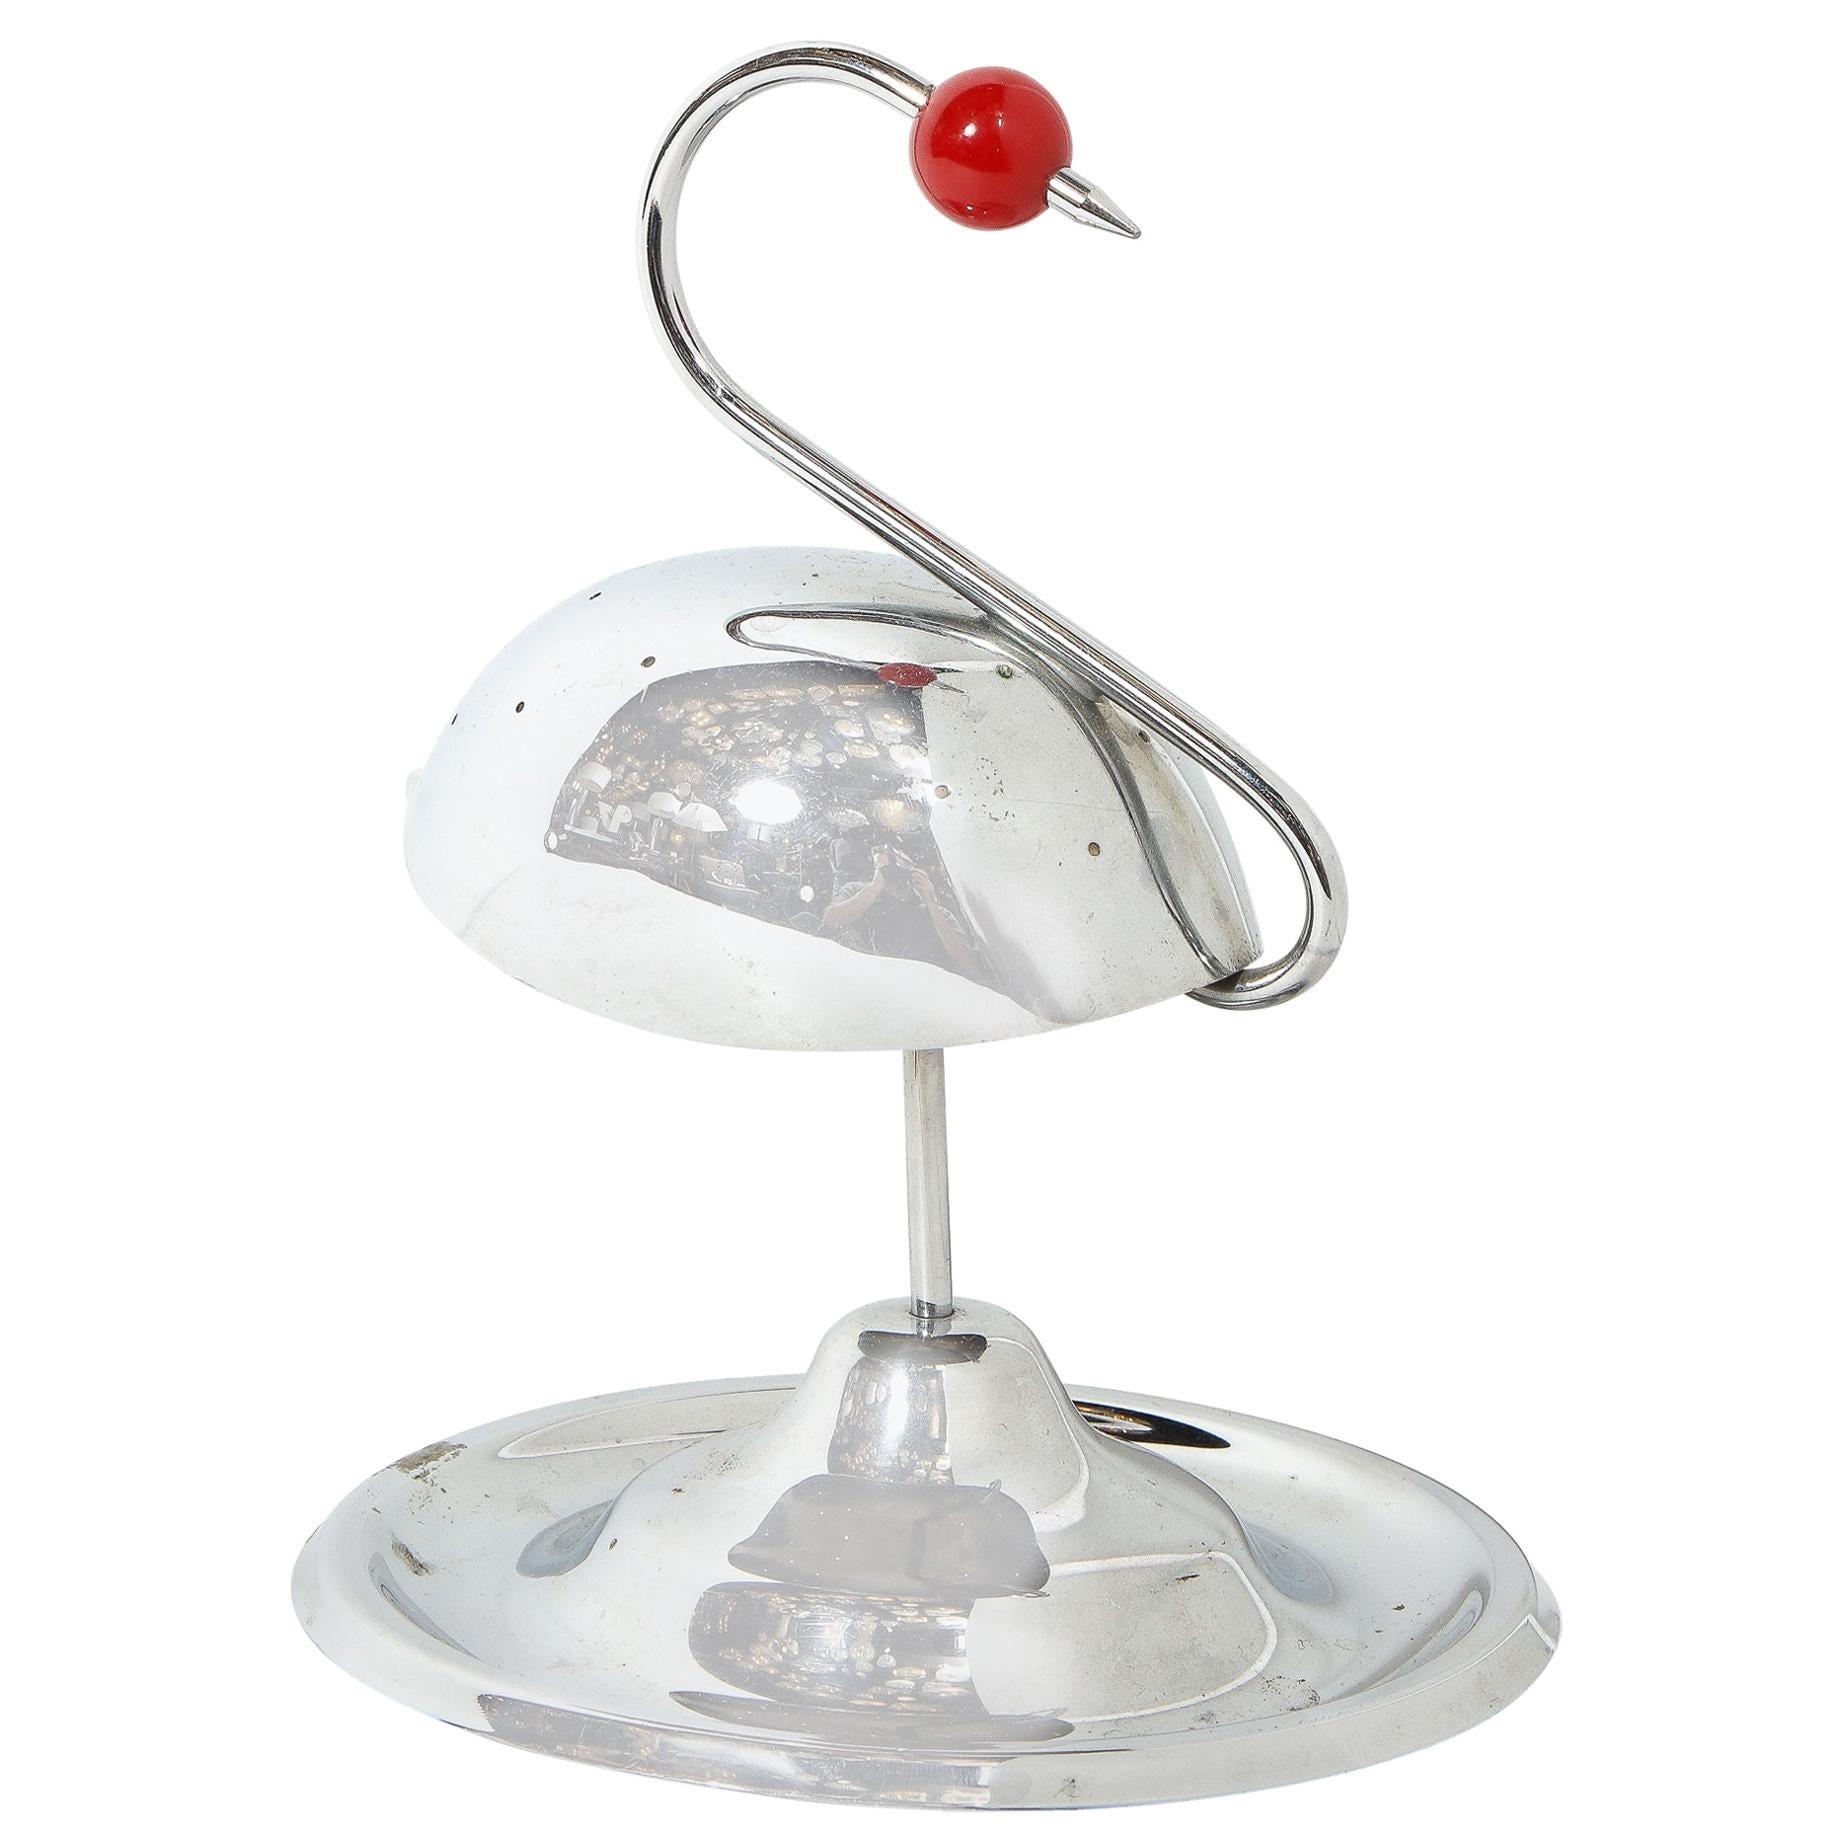 Art Deco Chrome and Carnelian Bakelite Stylized Swan Cocktail Holder by Napier